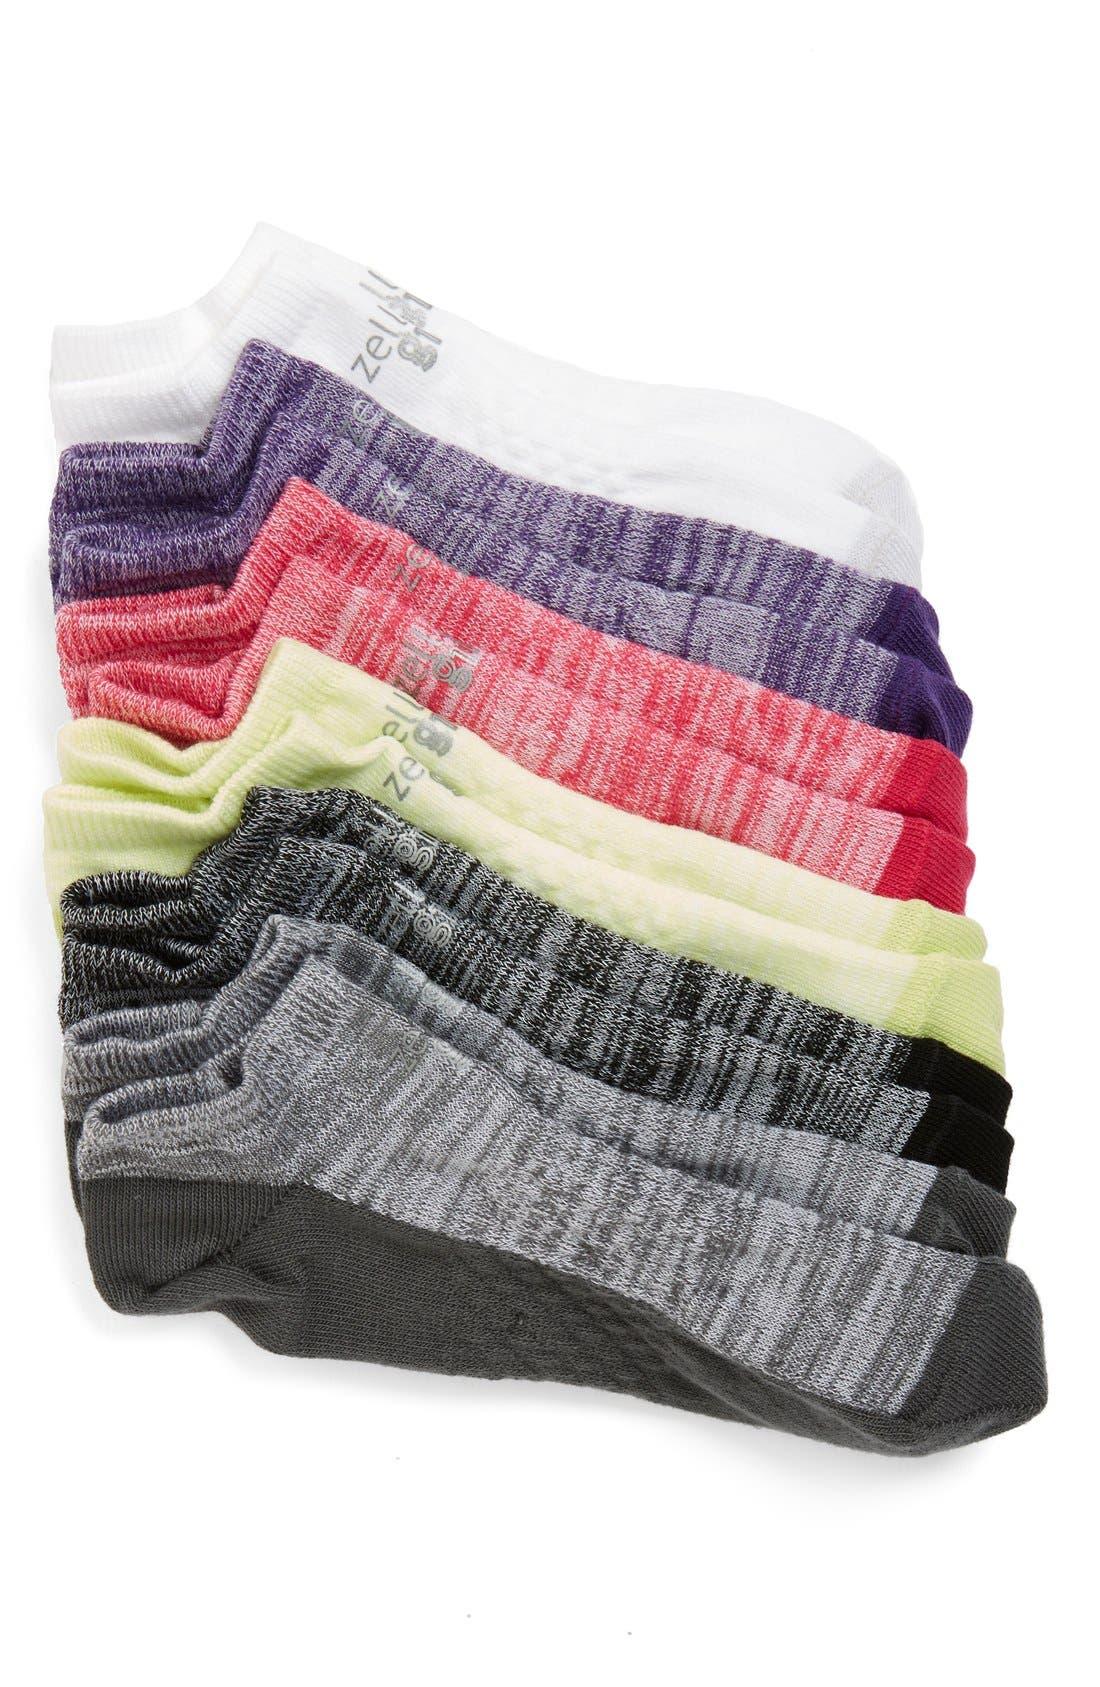 6-Pack Ankle Socks,                             Main thumbnail 7, color,